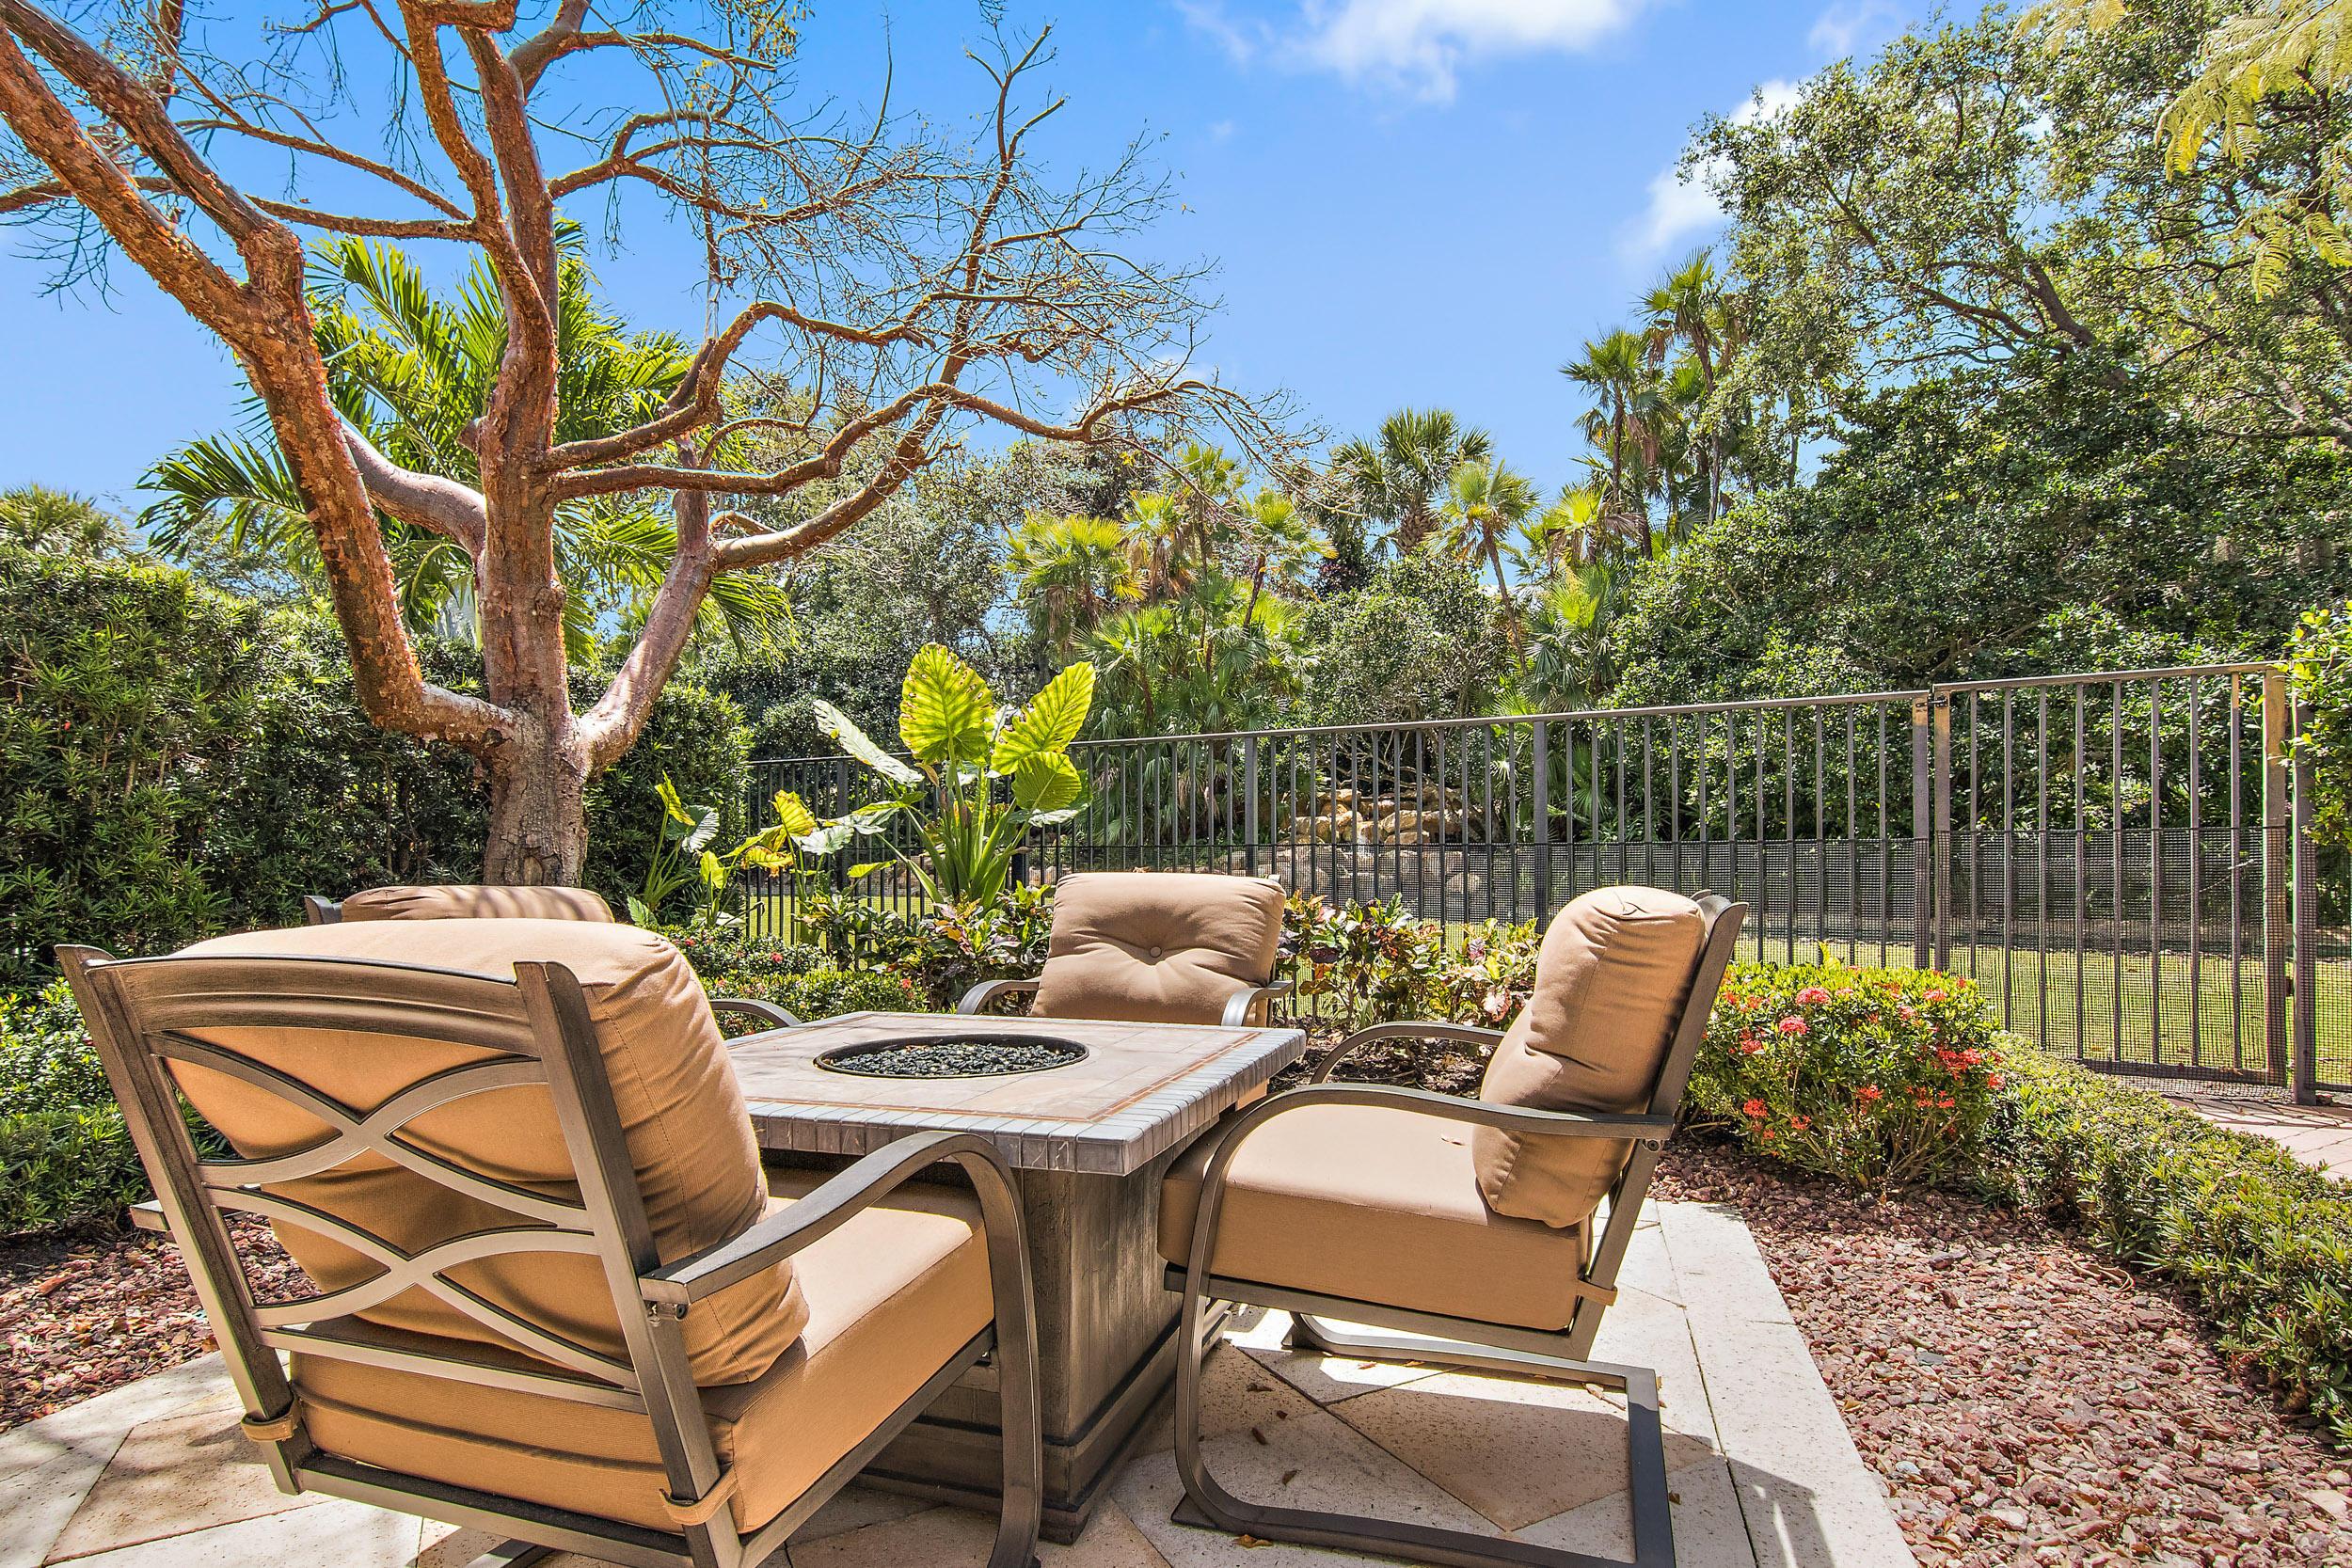 11208 Orange Hibiscus Lane, Palm Beach Gardens, Florida 33418, 3 Bedrooms Bedrooms, ,3.2 BathroomsBathrooms,A,Single family,Orange Hibiscus,RX-10423246